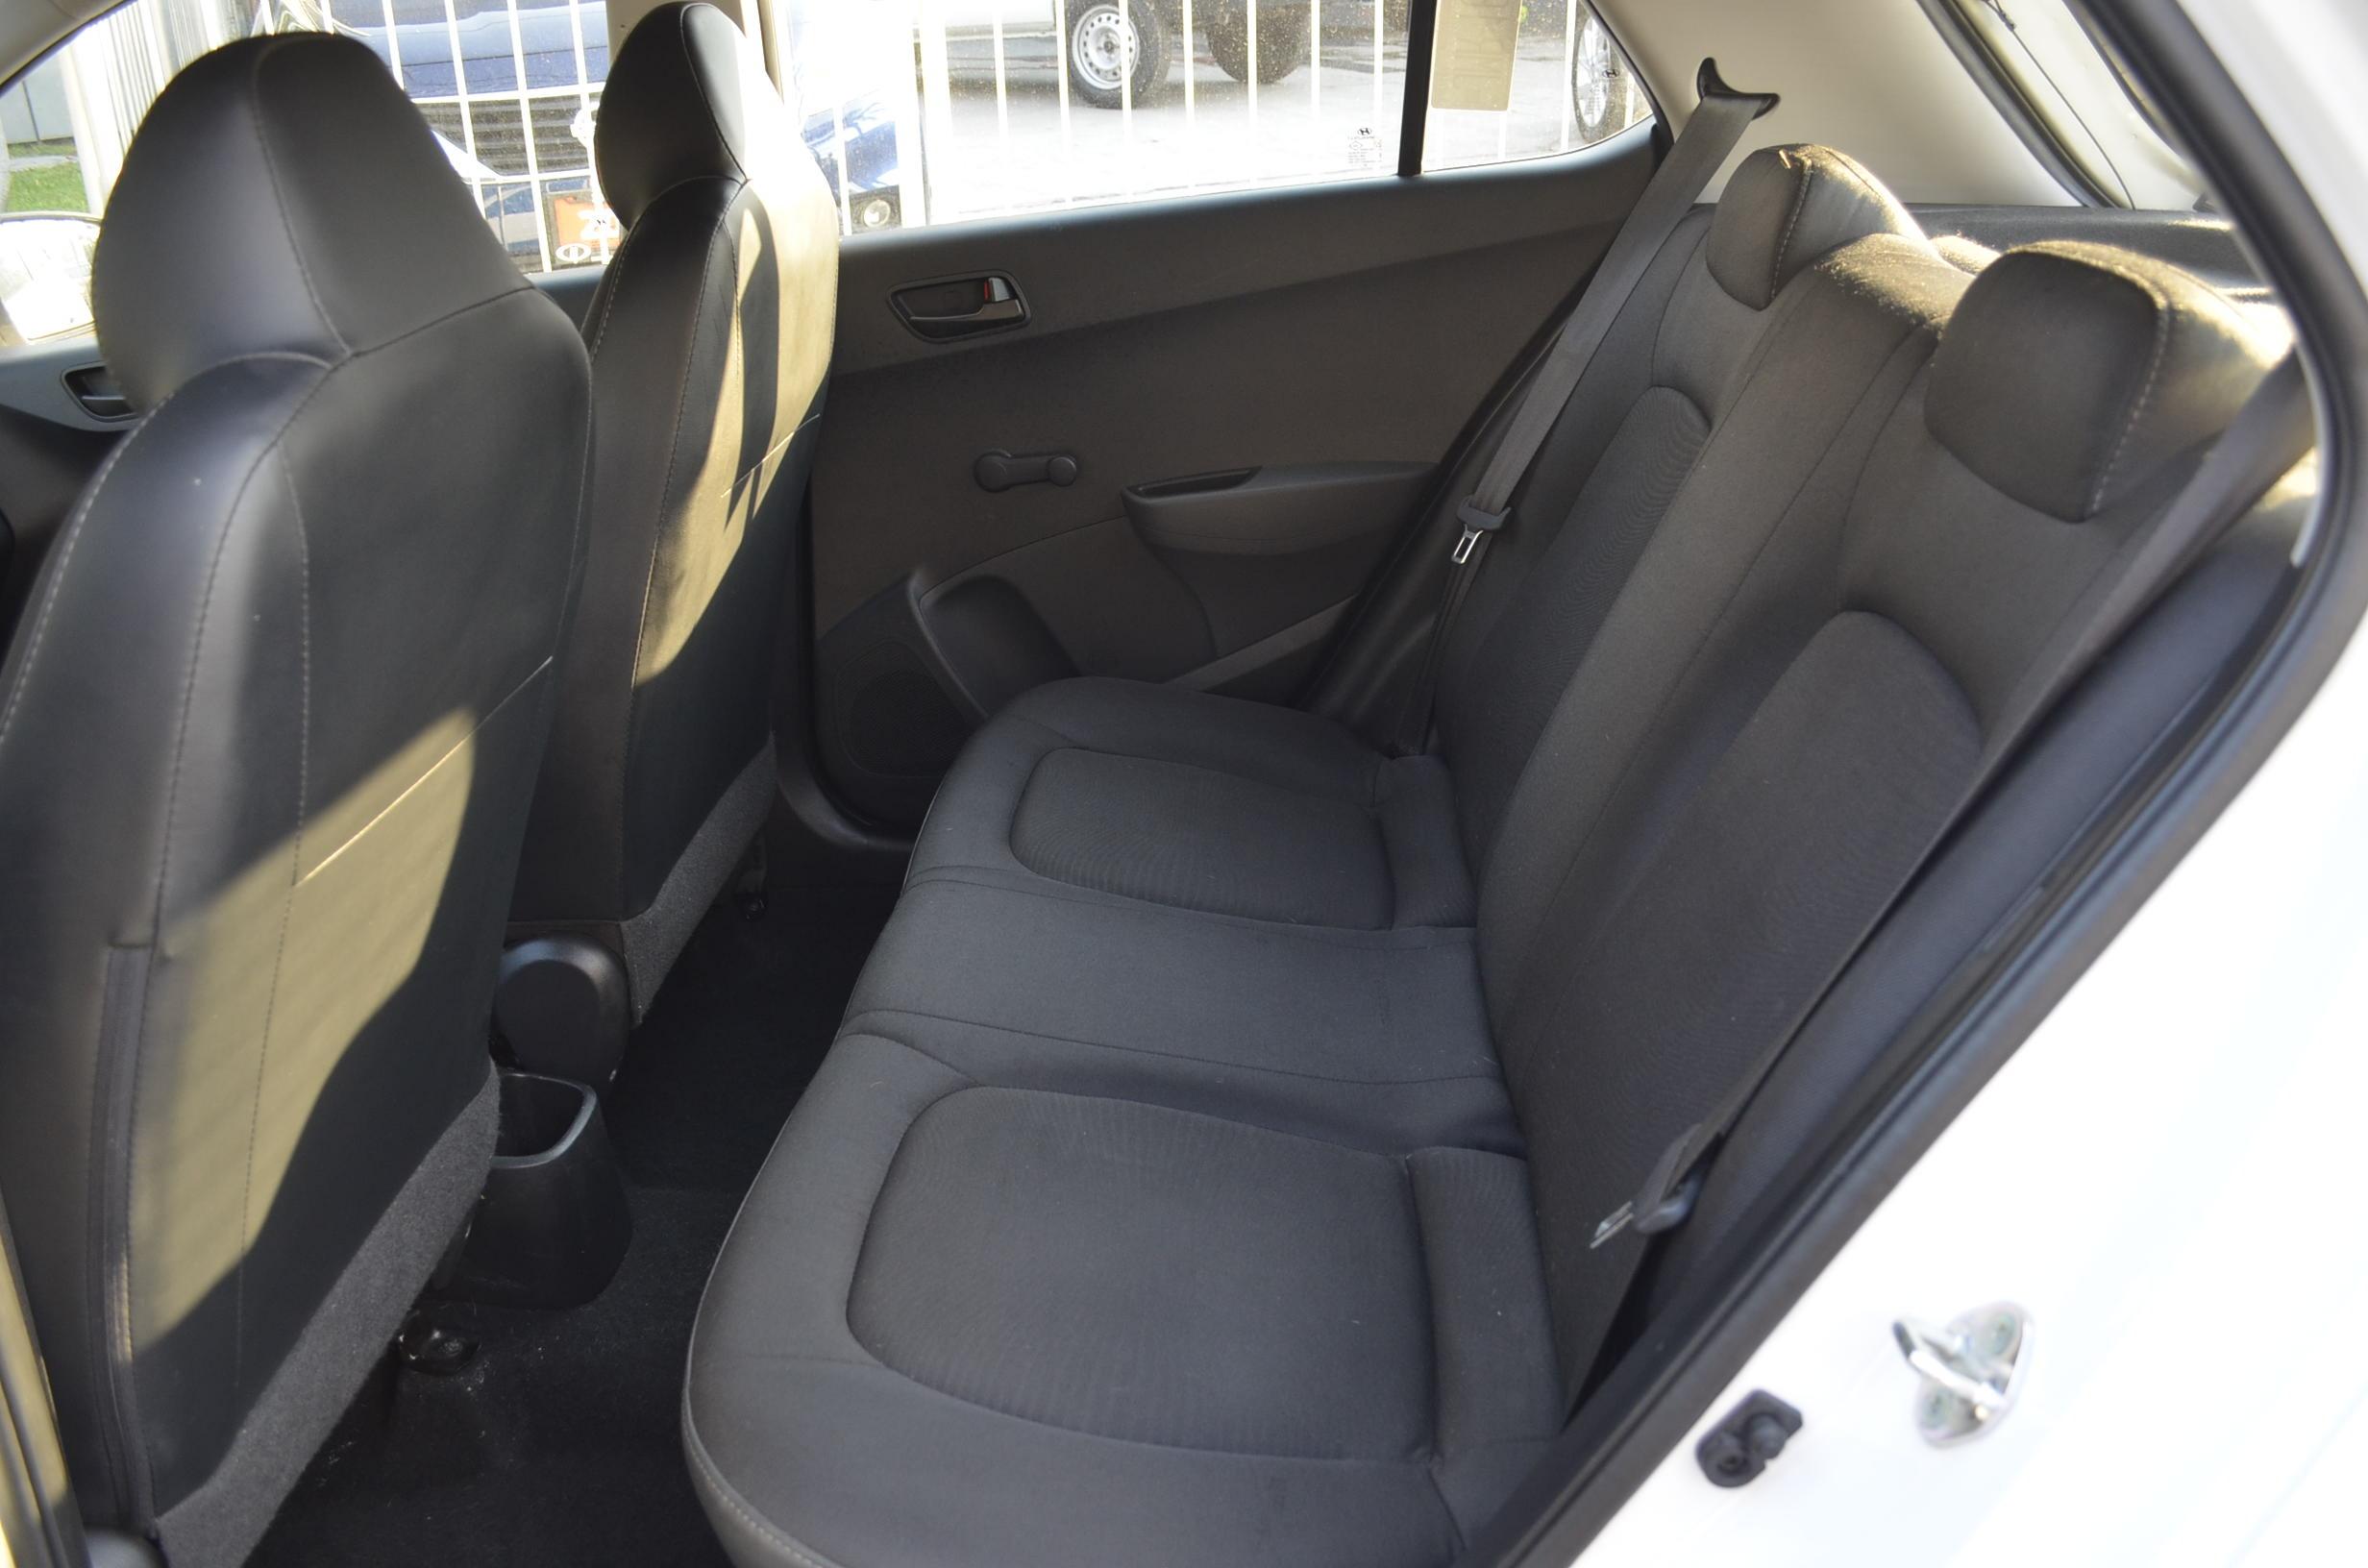 Hyundai Grand i10 Tablero 9